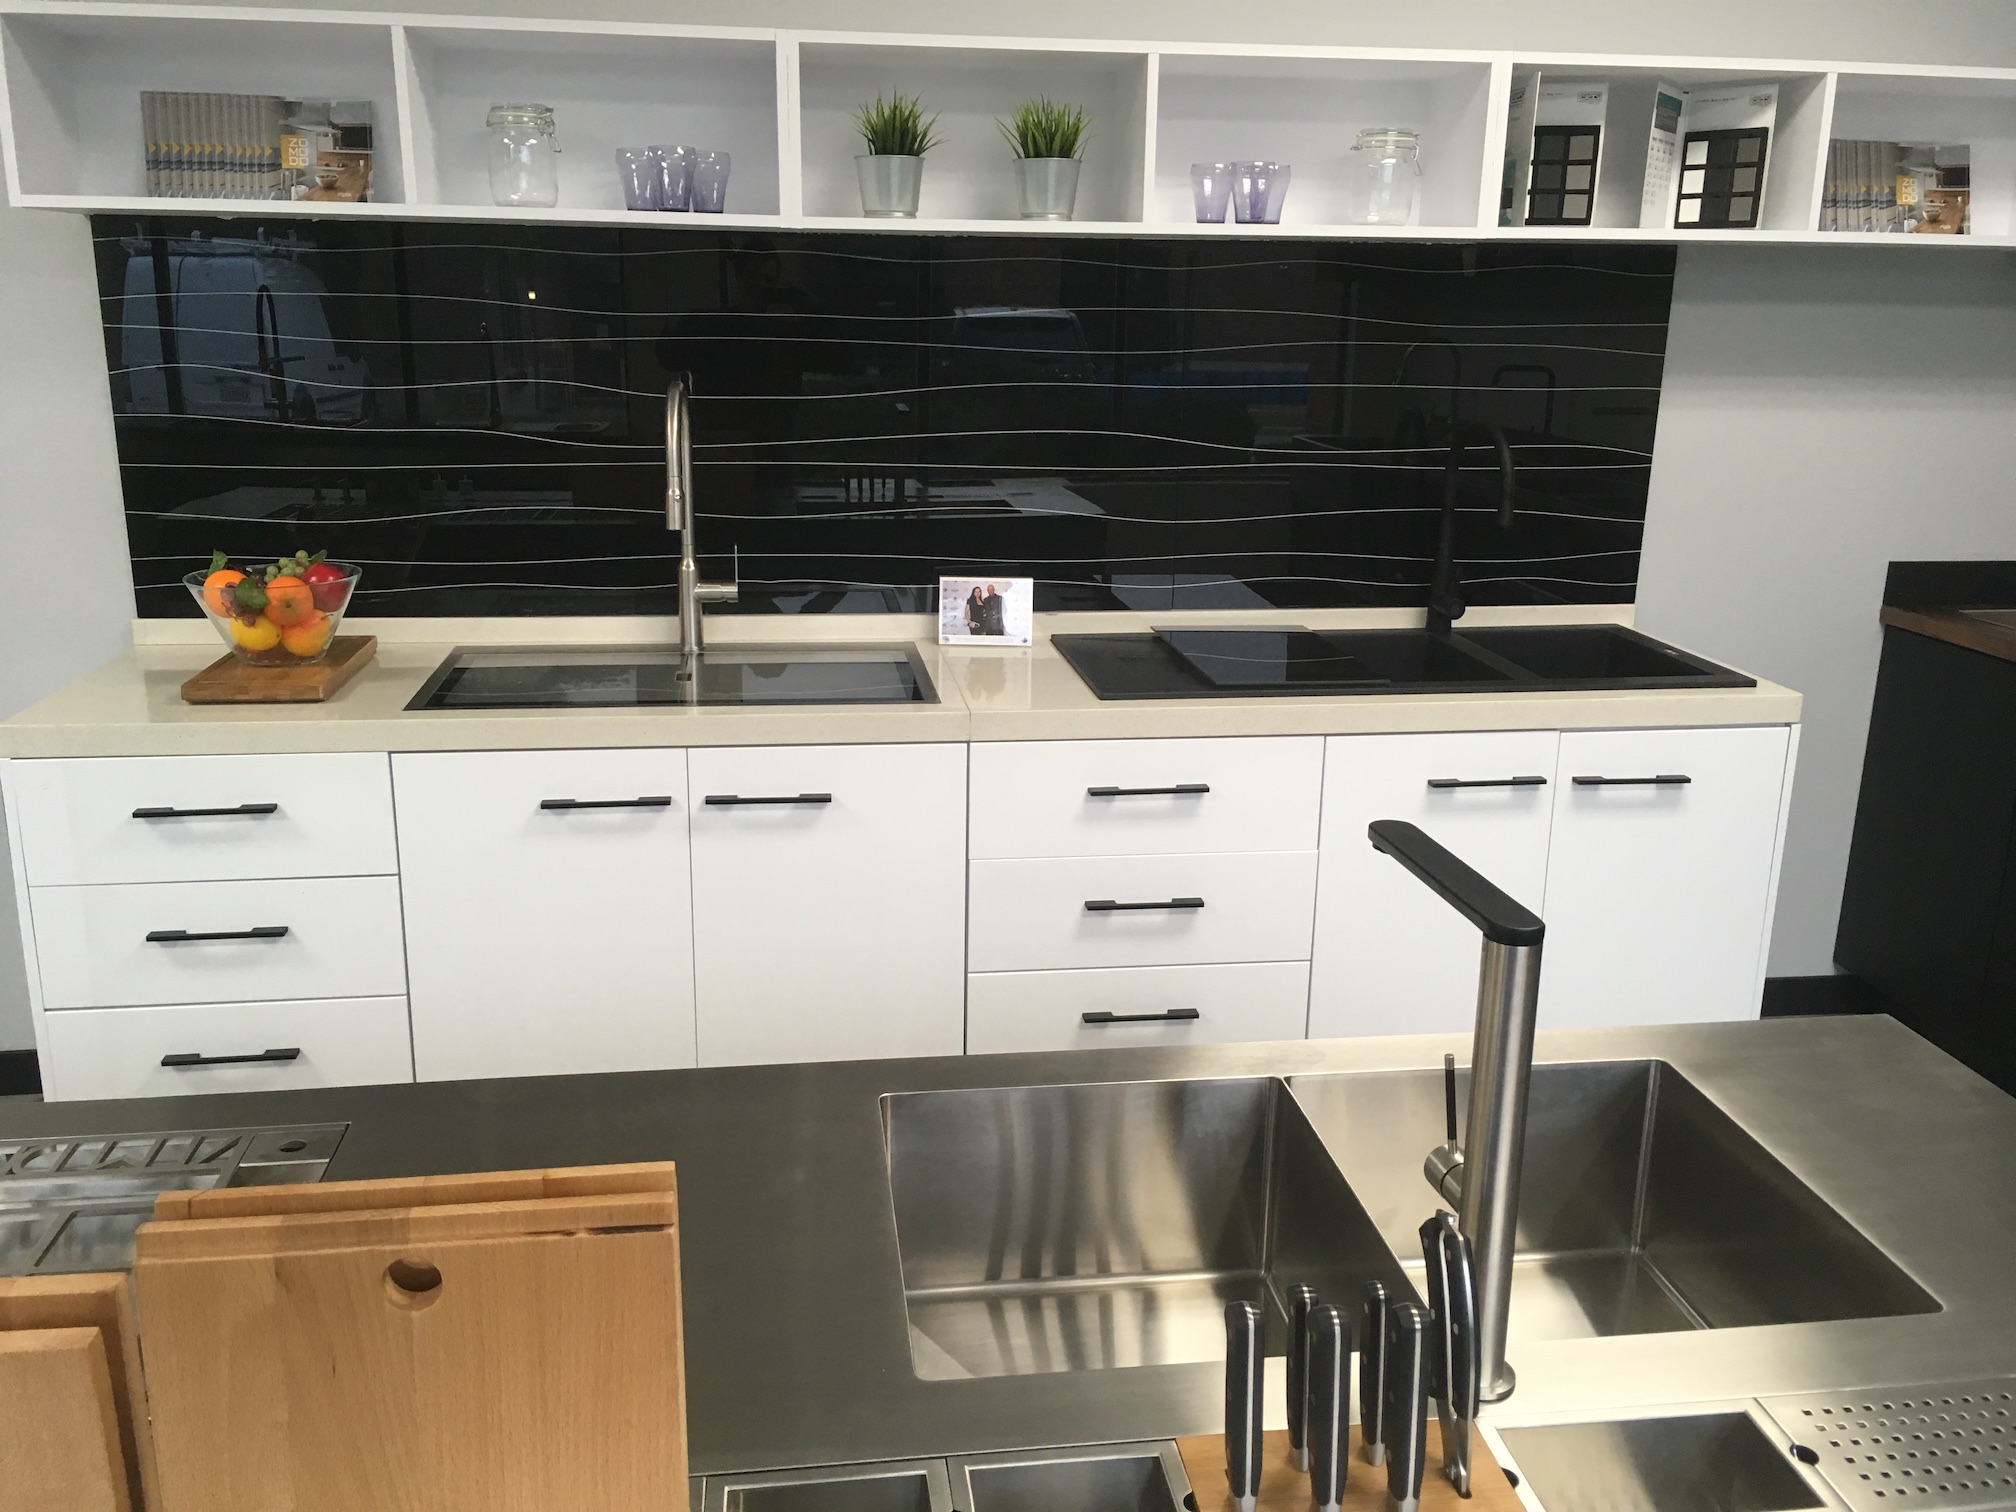 Deccor Zomodo Showroom Canada Kitchen Sink